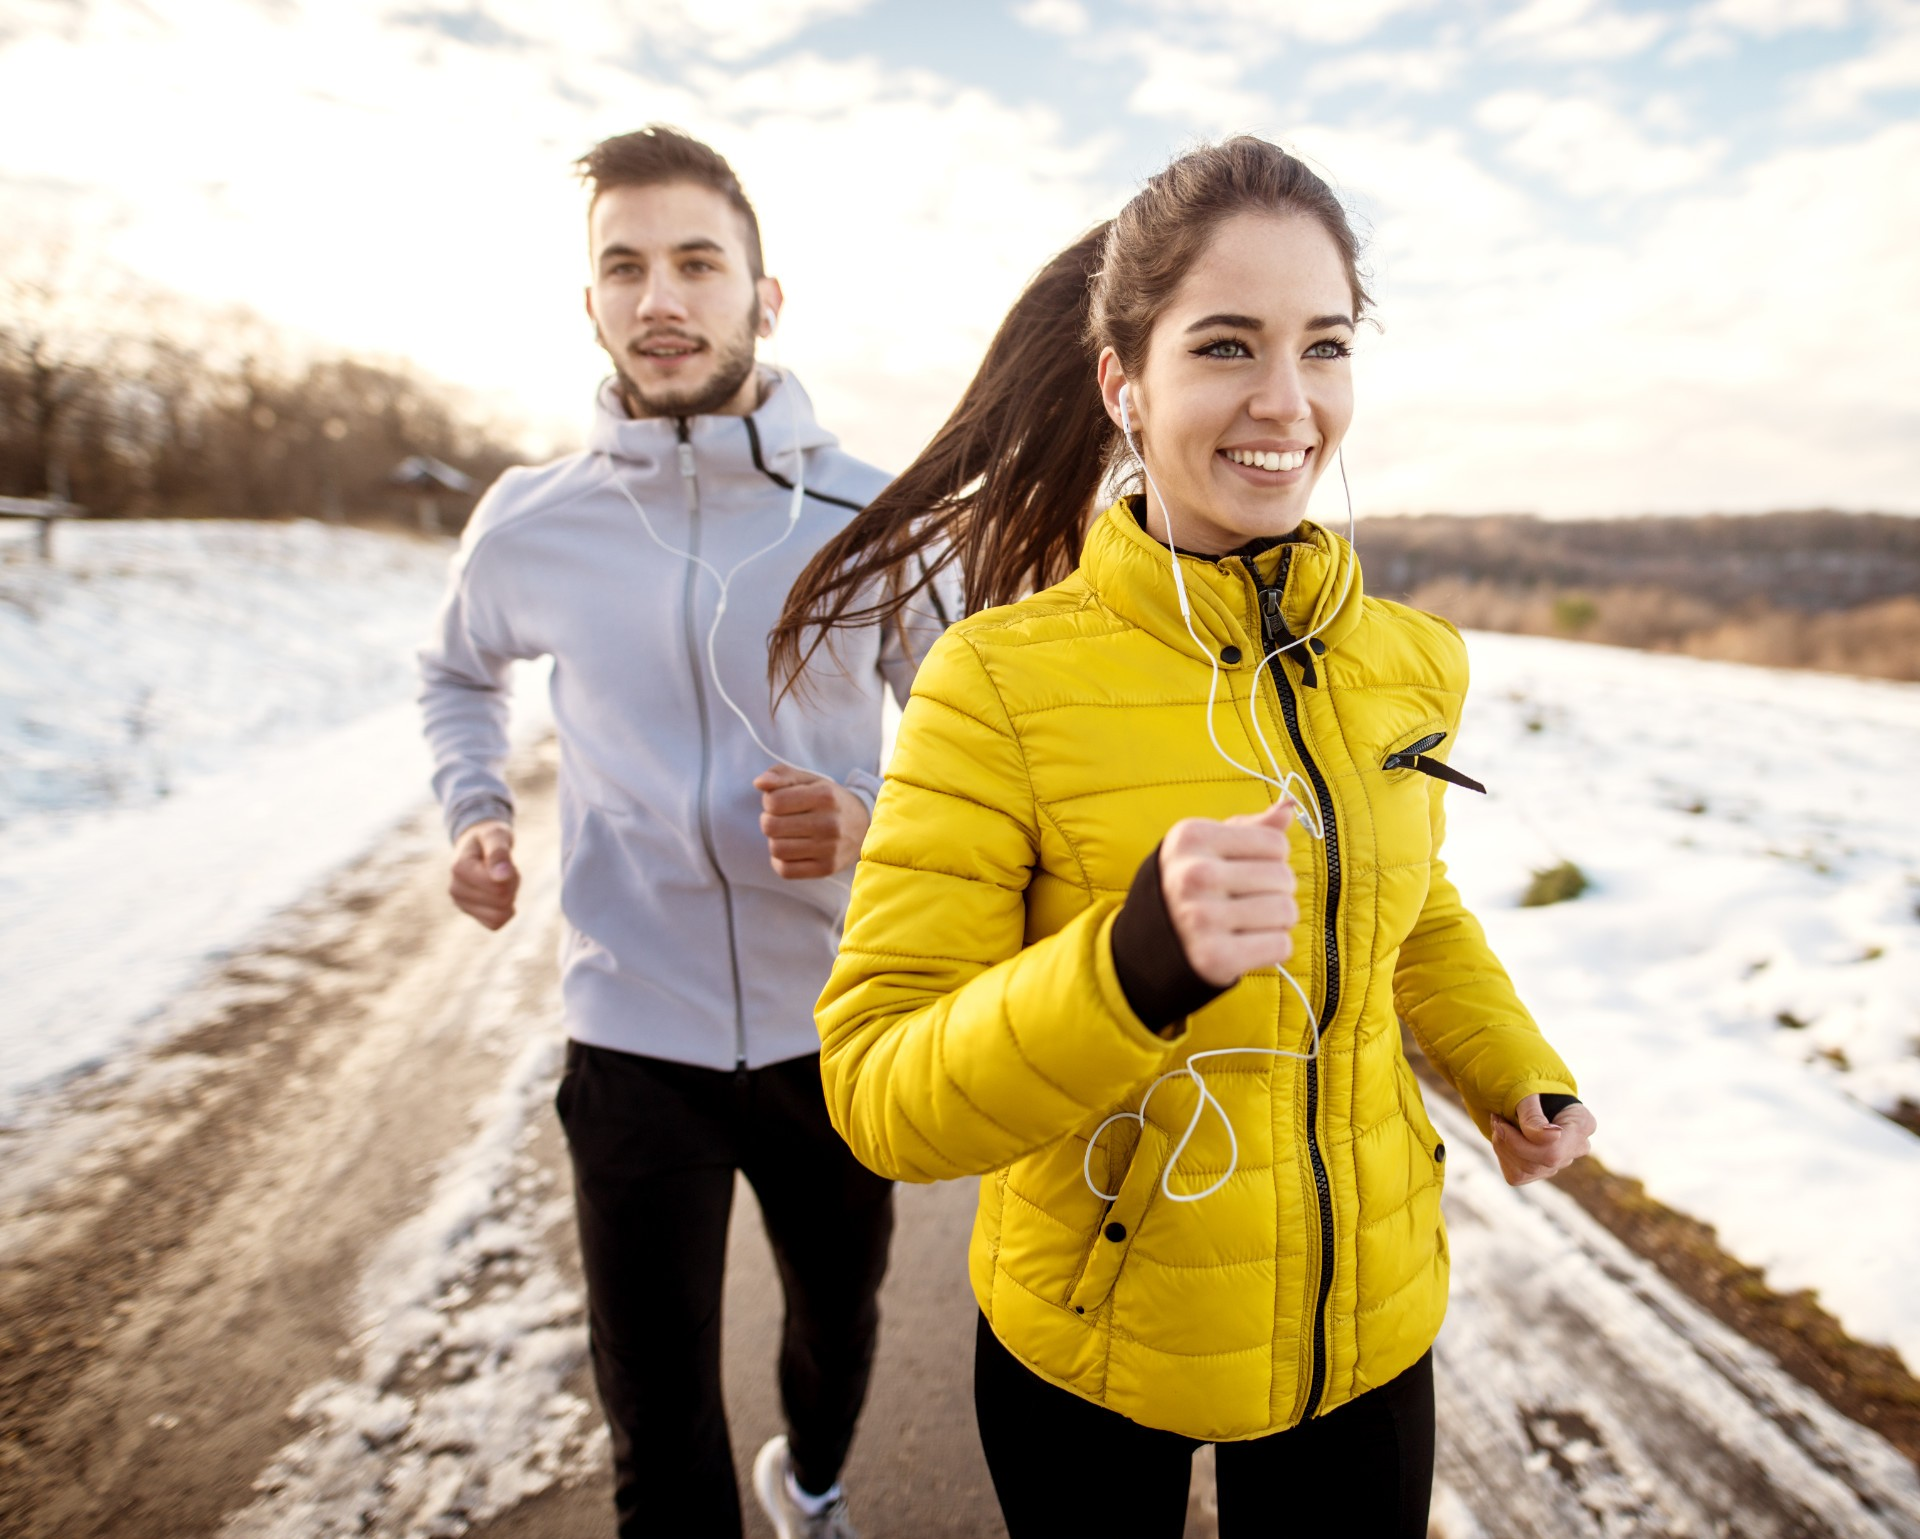 Článok EuroPainClinics vydala Medycyna Sportowa